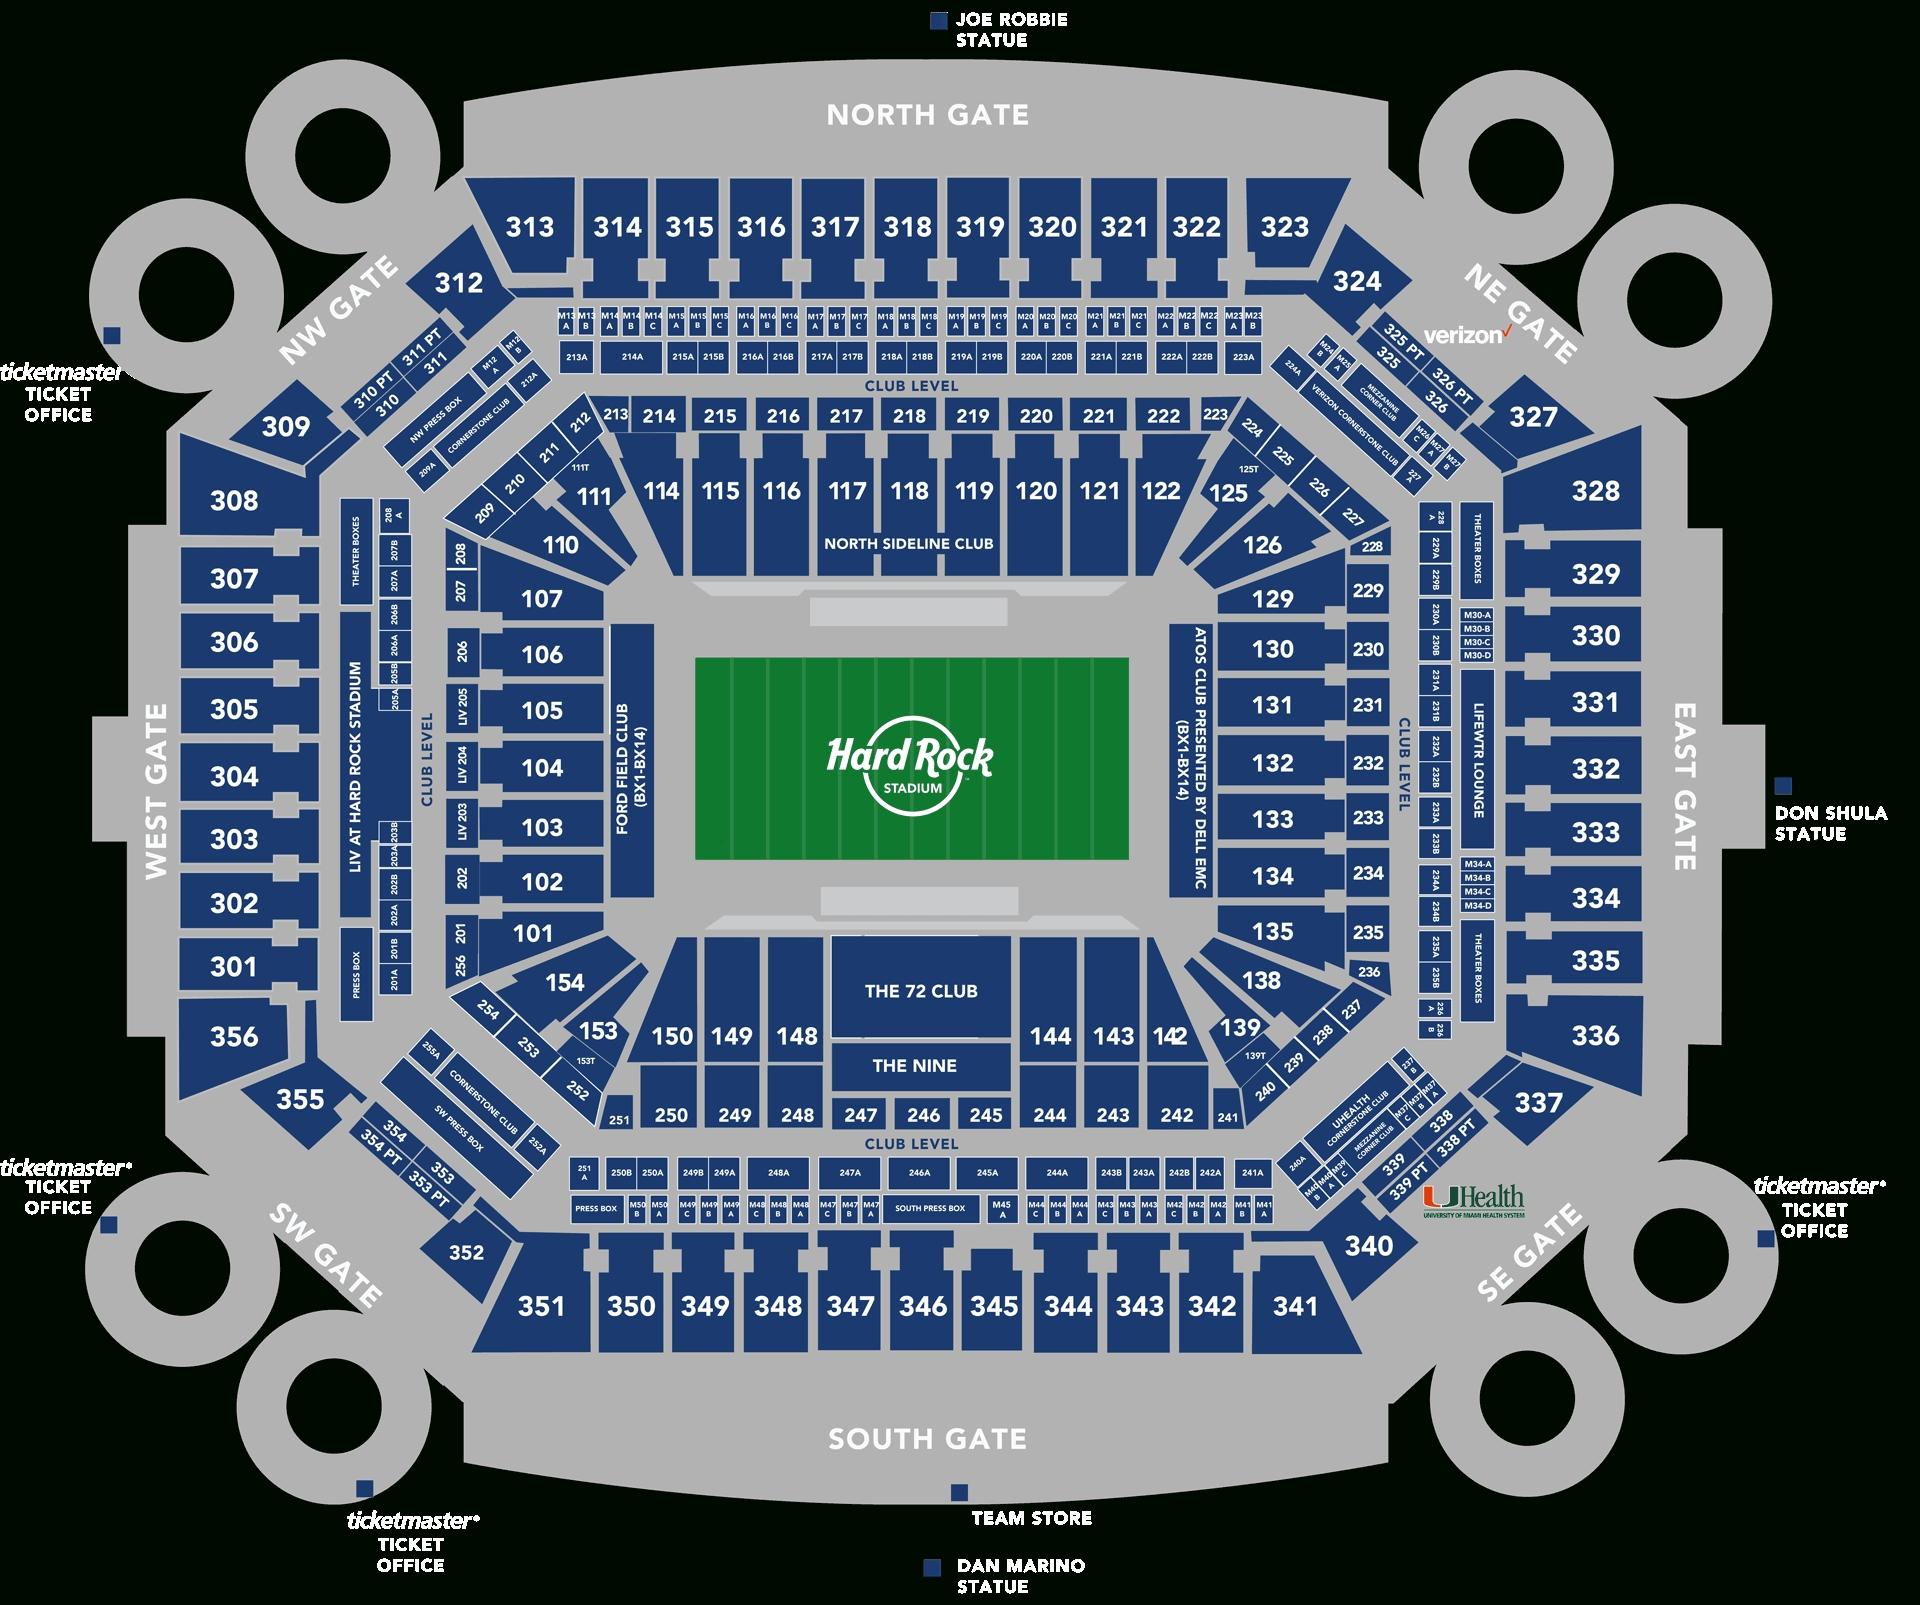 Stadium Seating Chart - Hard Rock Stadium pertaining to Super Bowl Seating Chart Seat Numbers